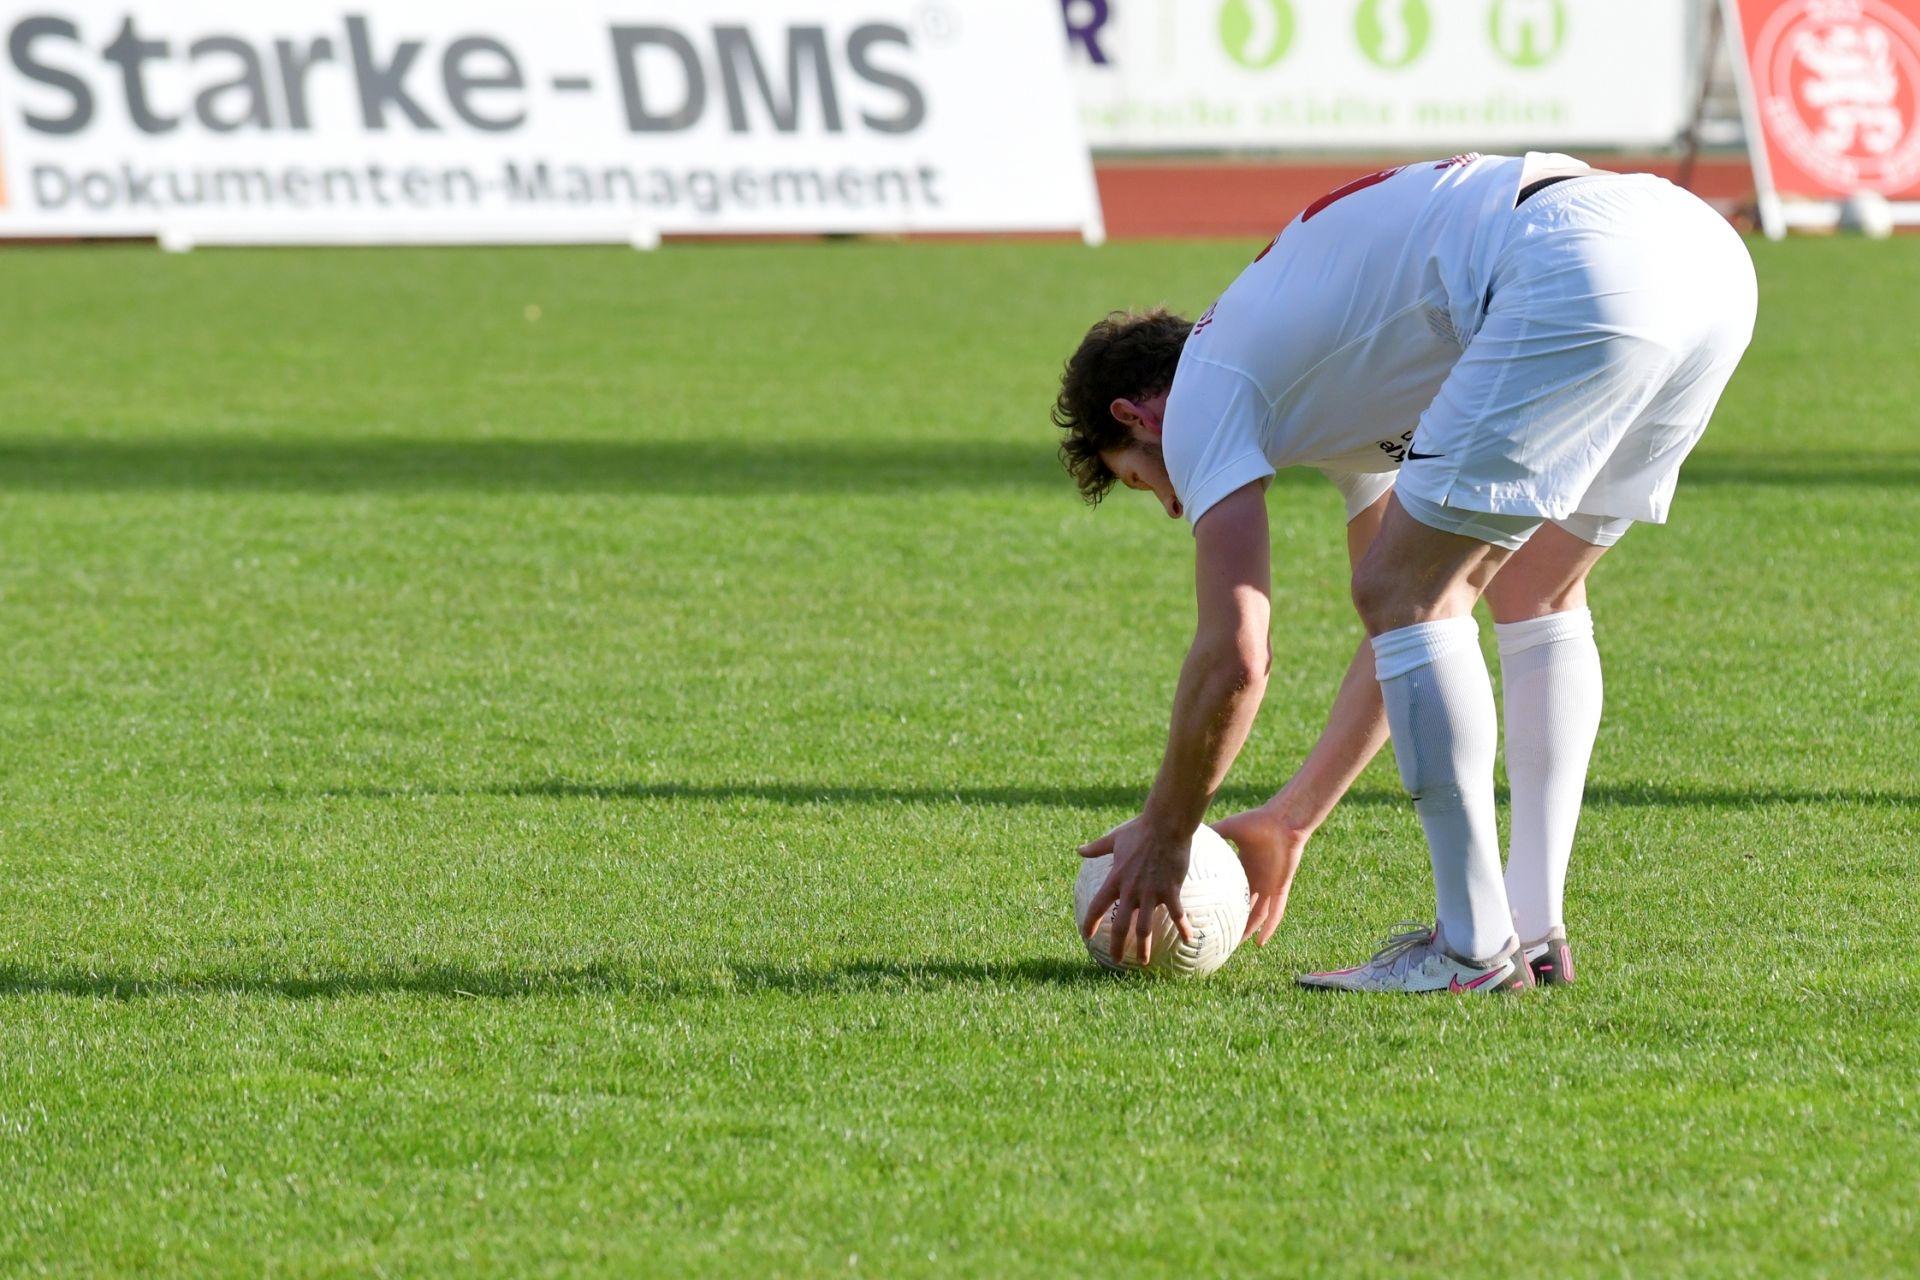 Regionalliga S�dwest 2020/21, KSV Hessen Kassel, 1. FSV Mainz 05 II, Endstand 2:1, Freistoß